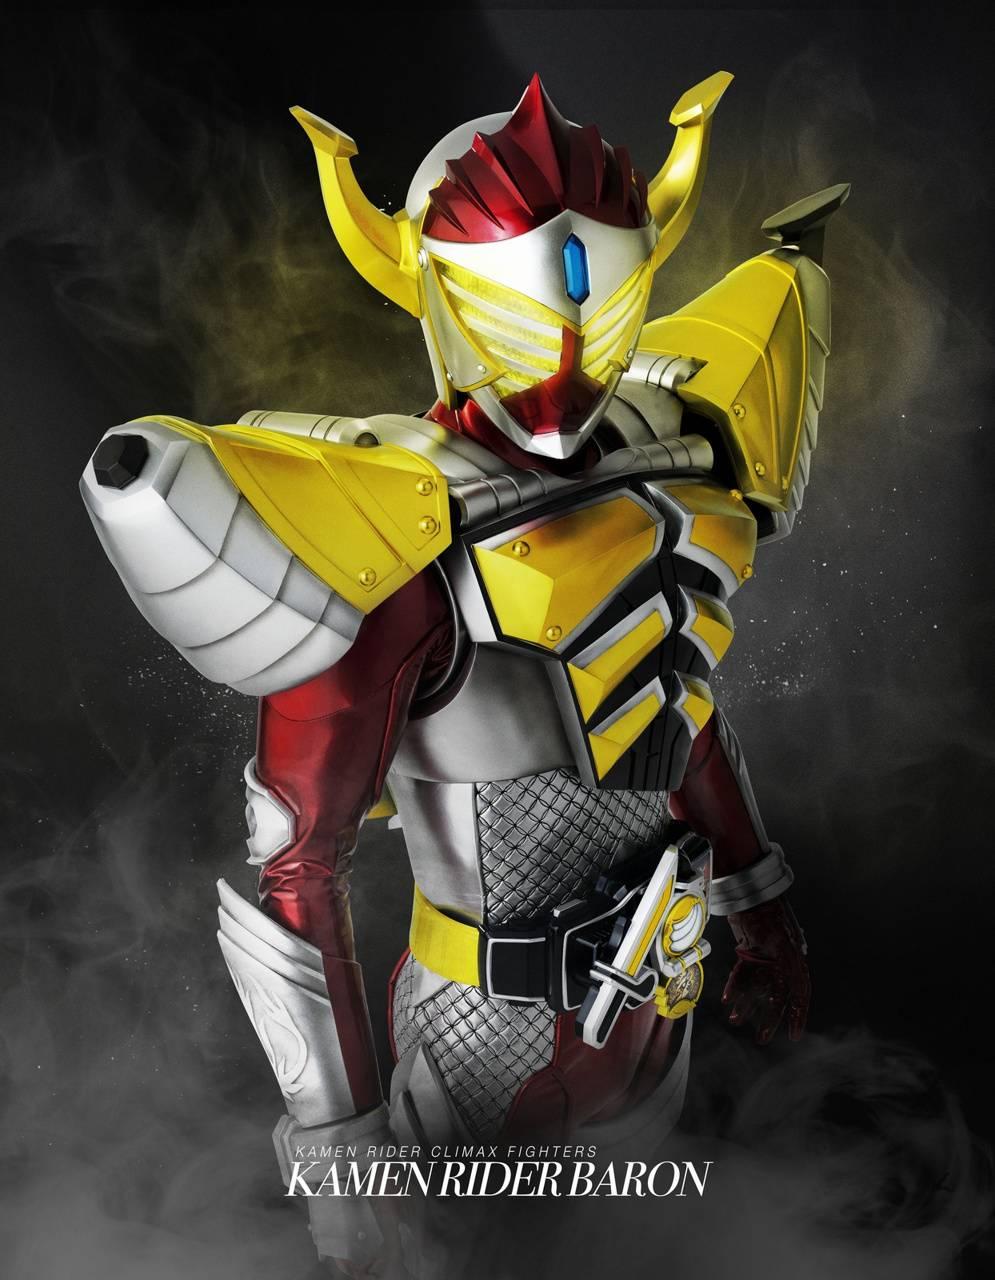 Kamen rider baron